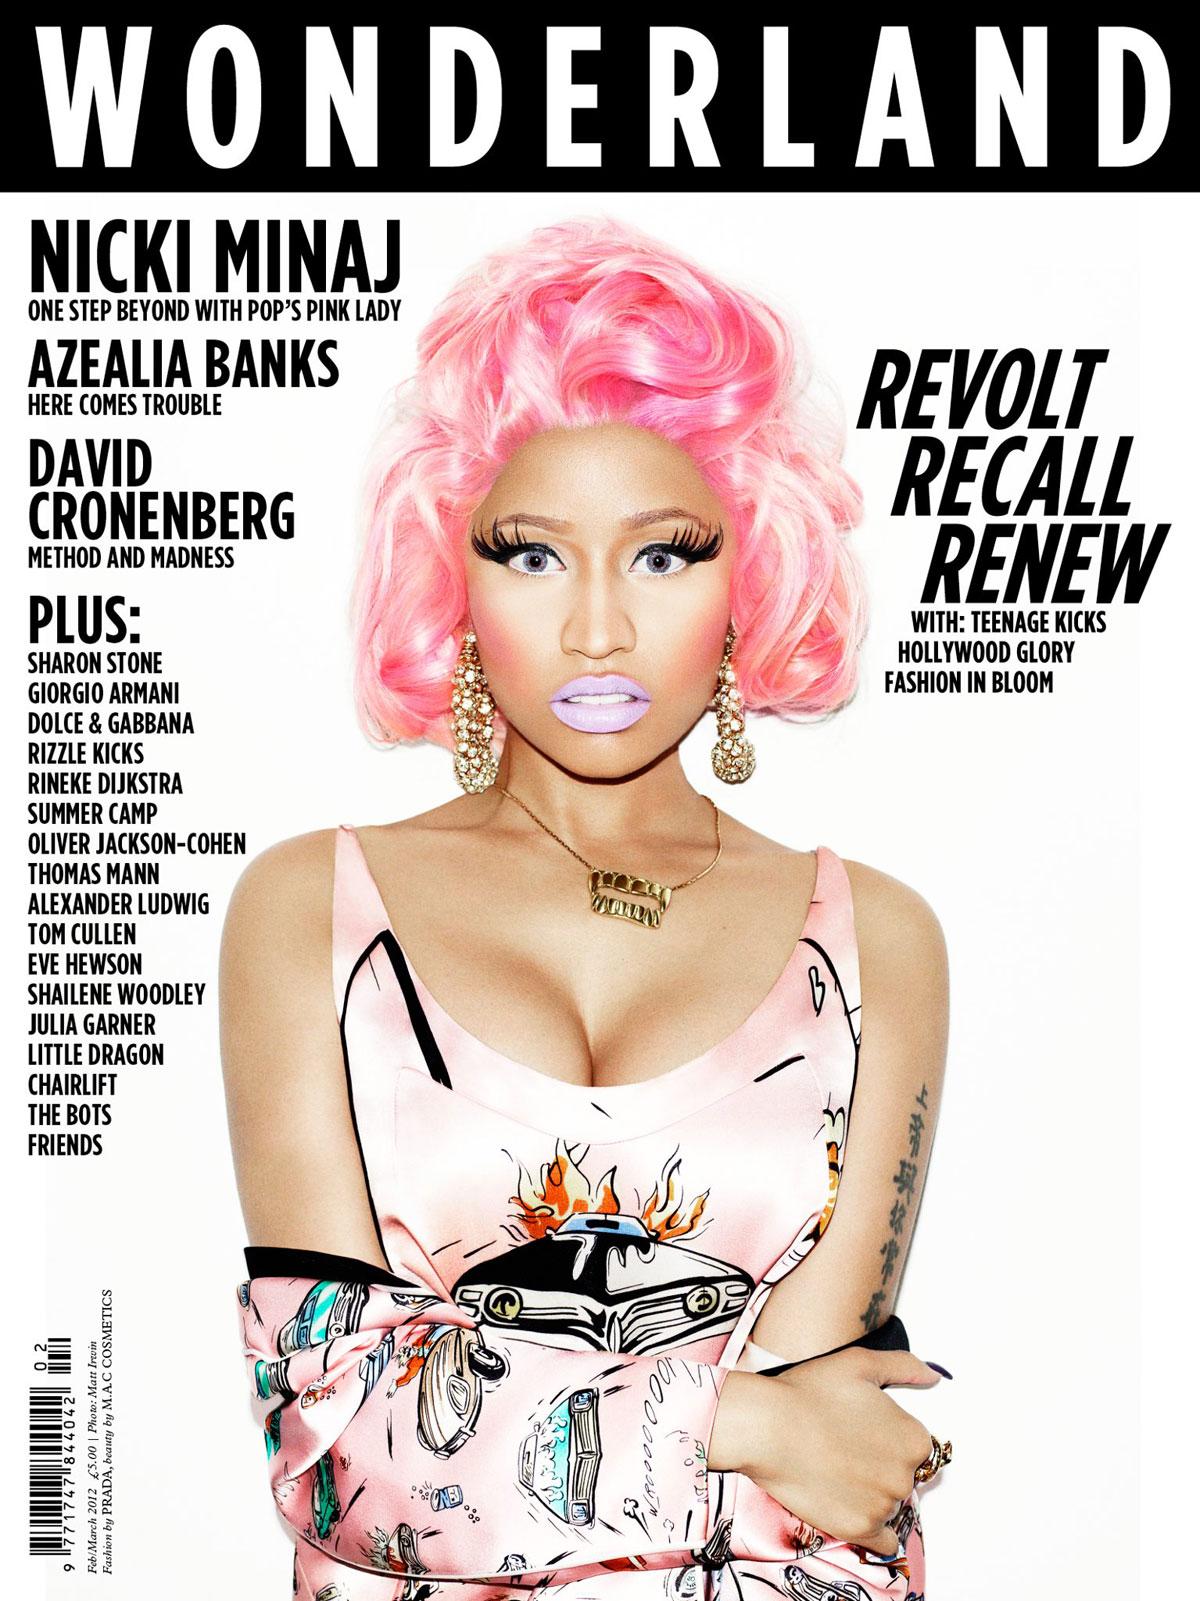 Nicki Minaj in PRADA for Wonderland Magazine